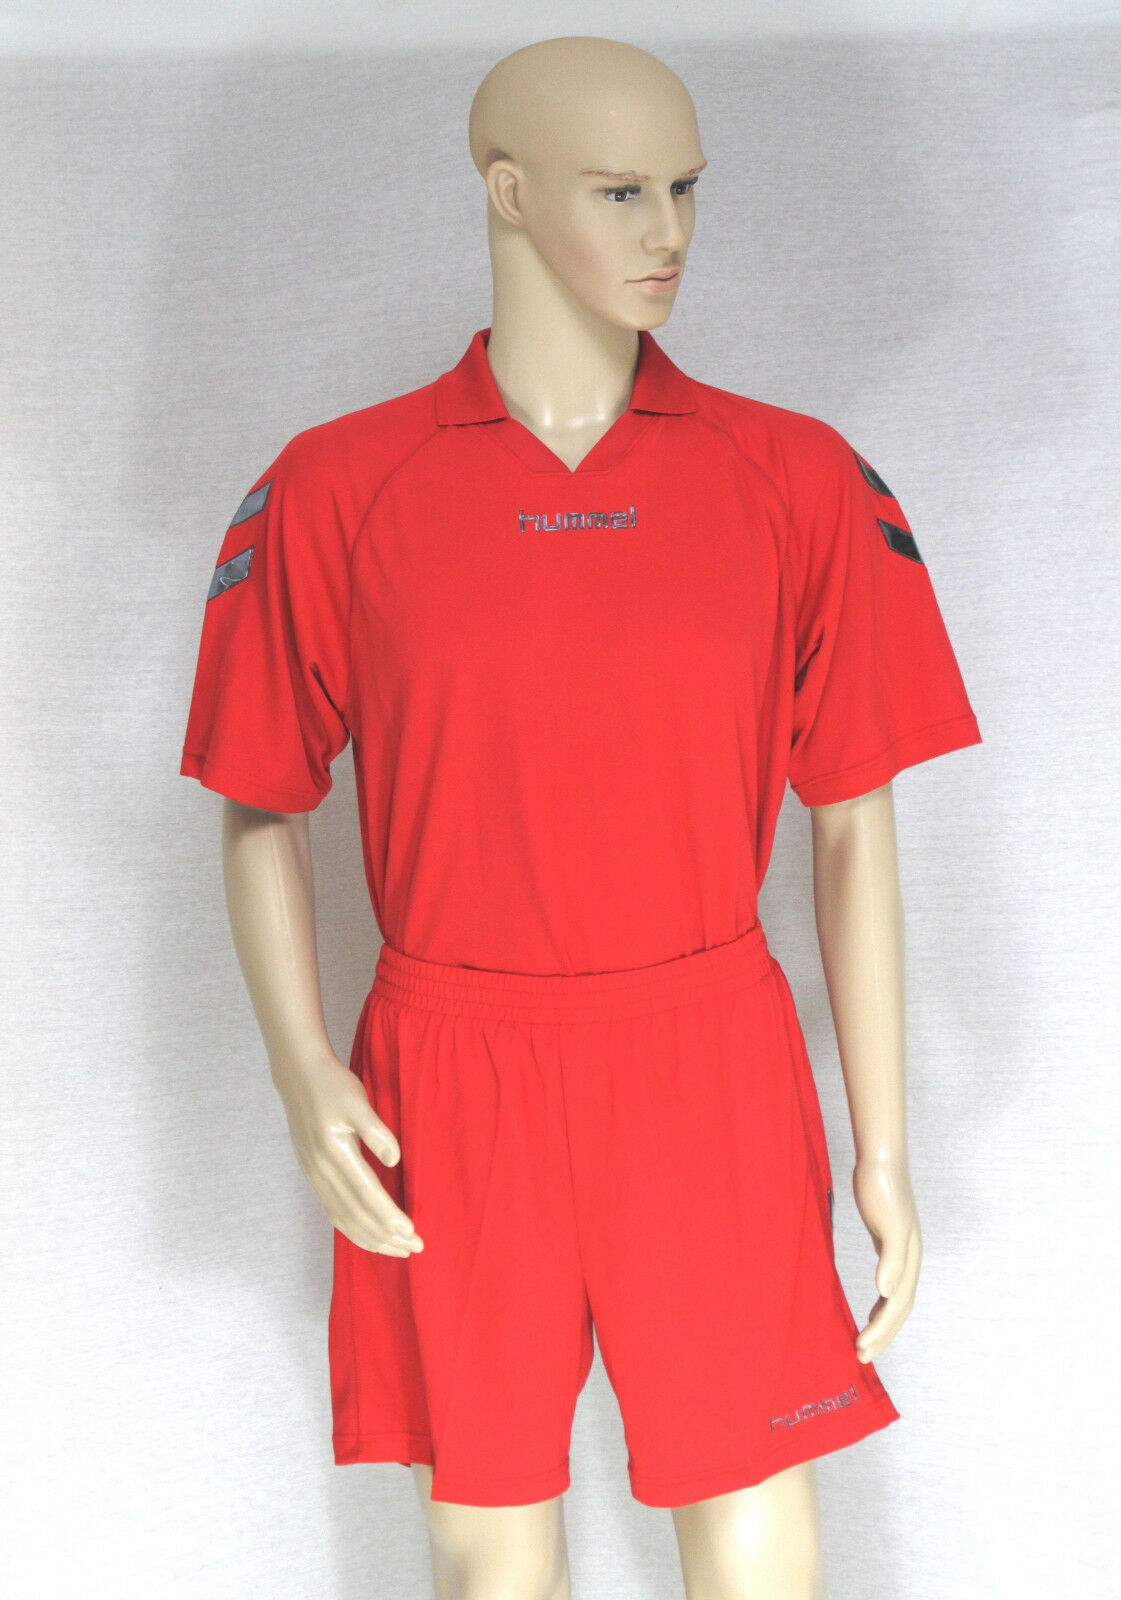 Hummel Set de Camisetas Fútbol 14-teilig - Pantalones Punto Medias Deporte -100%